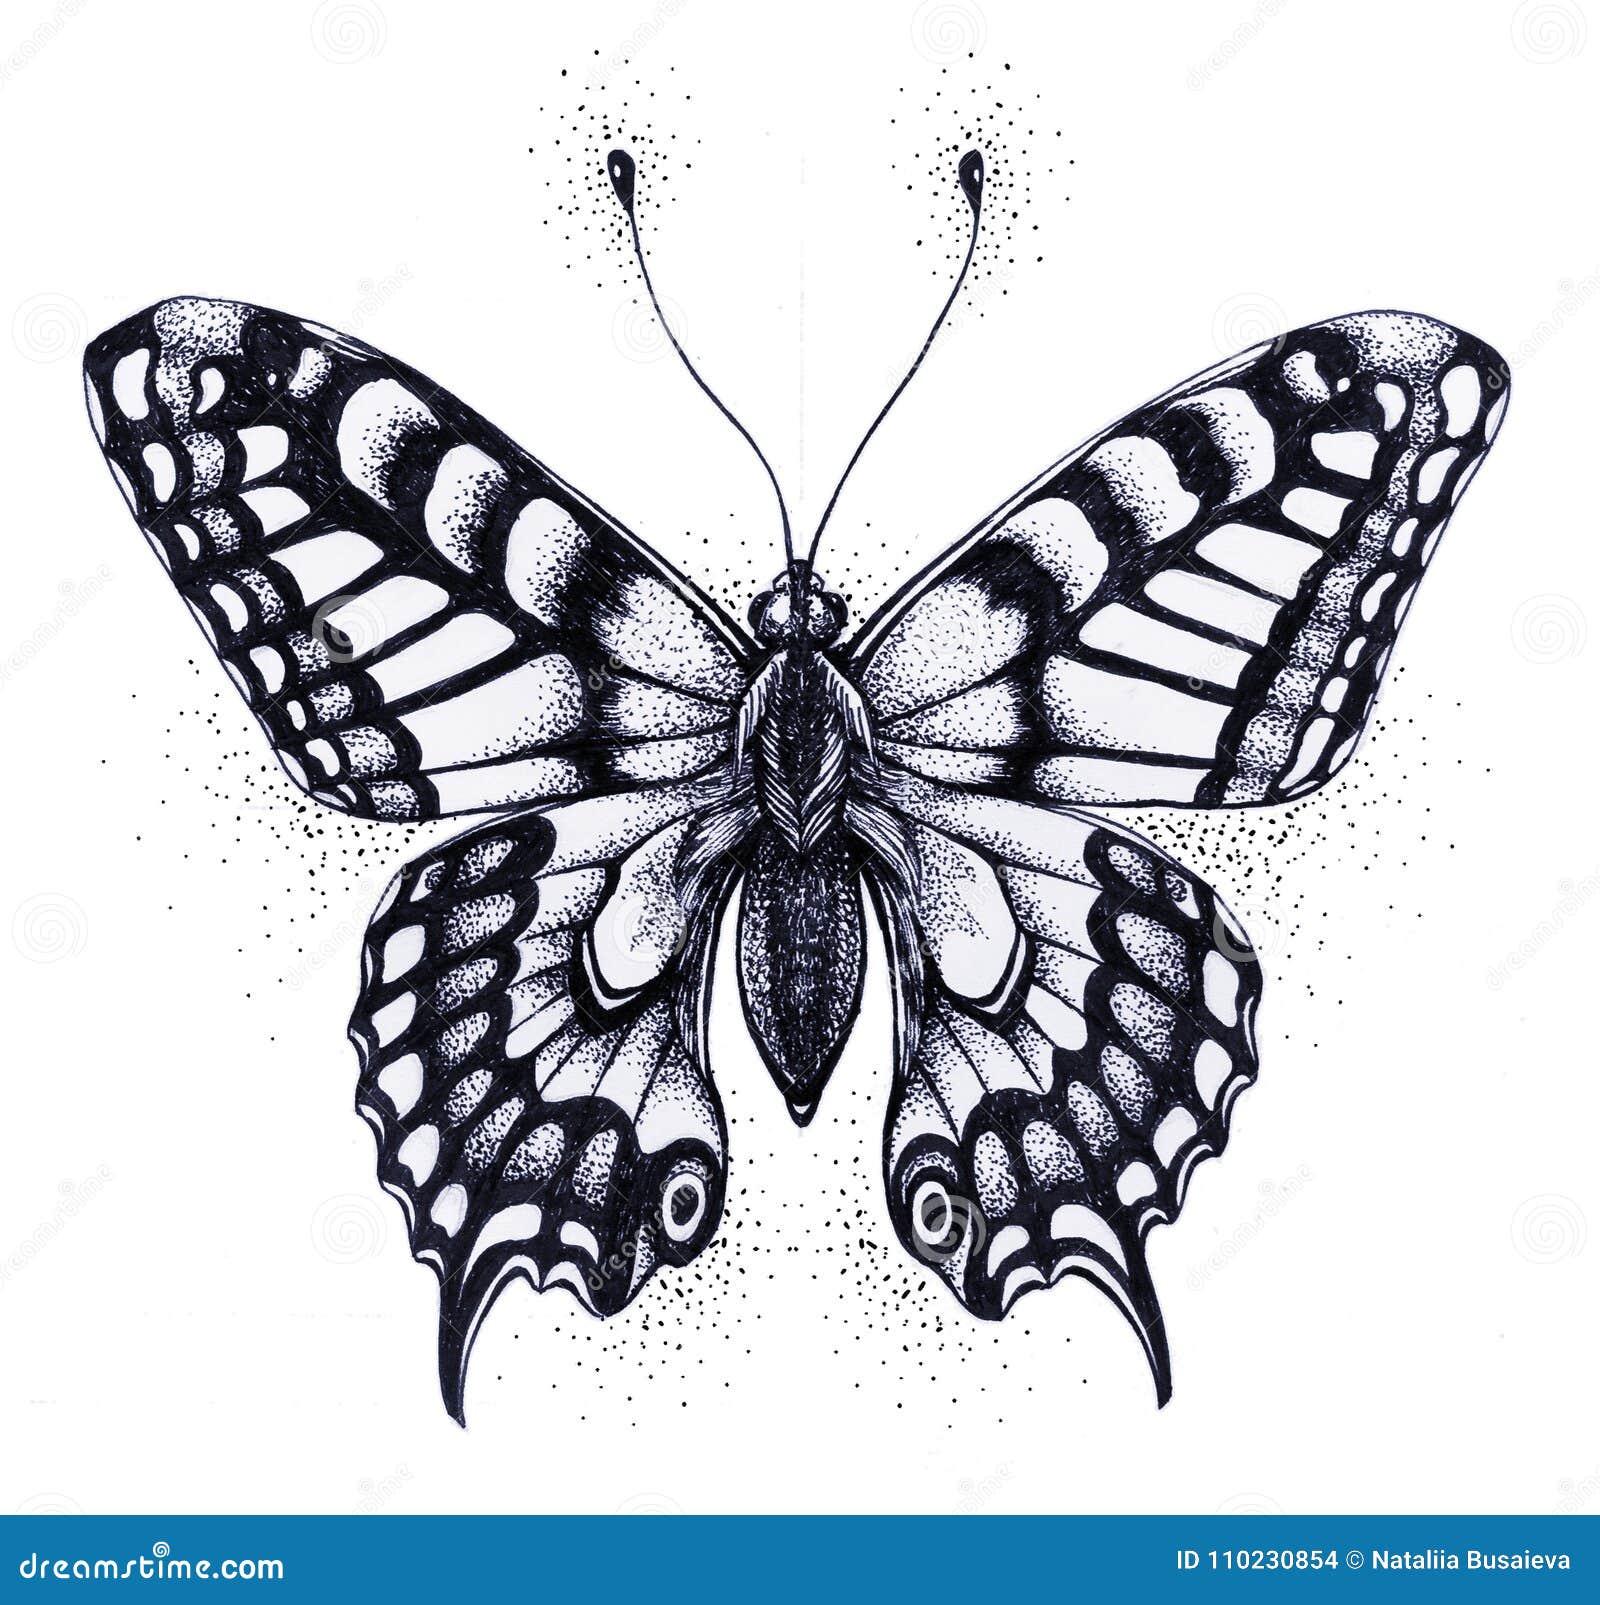 Silueta De La Mariposa Simbolo Del Alma De La Inmortalidad Del